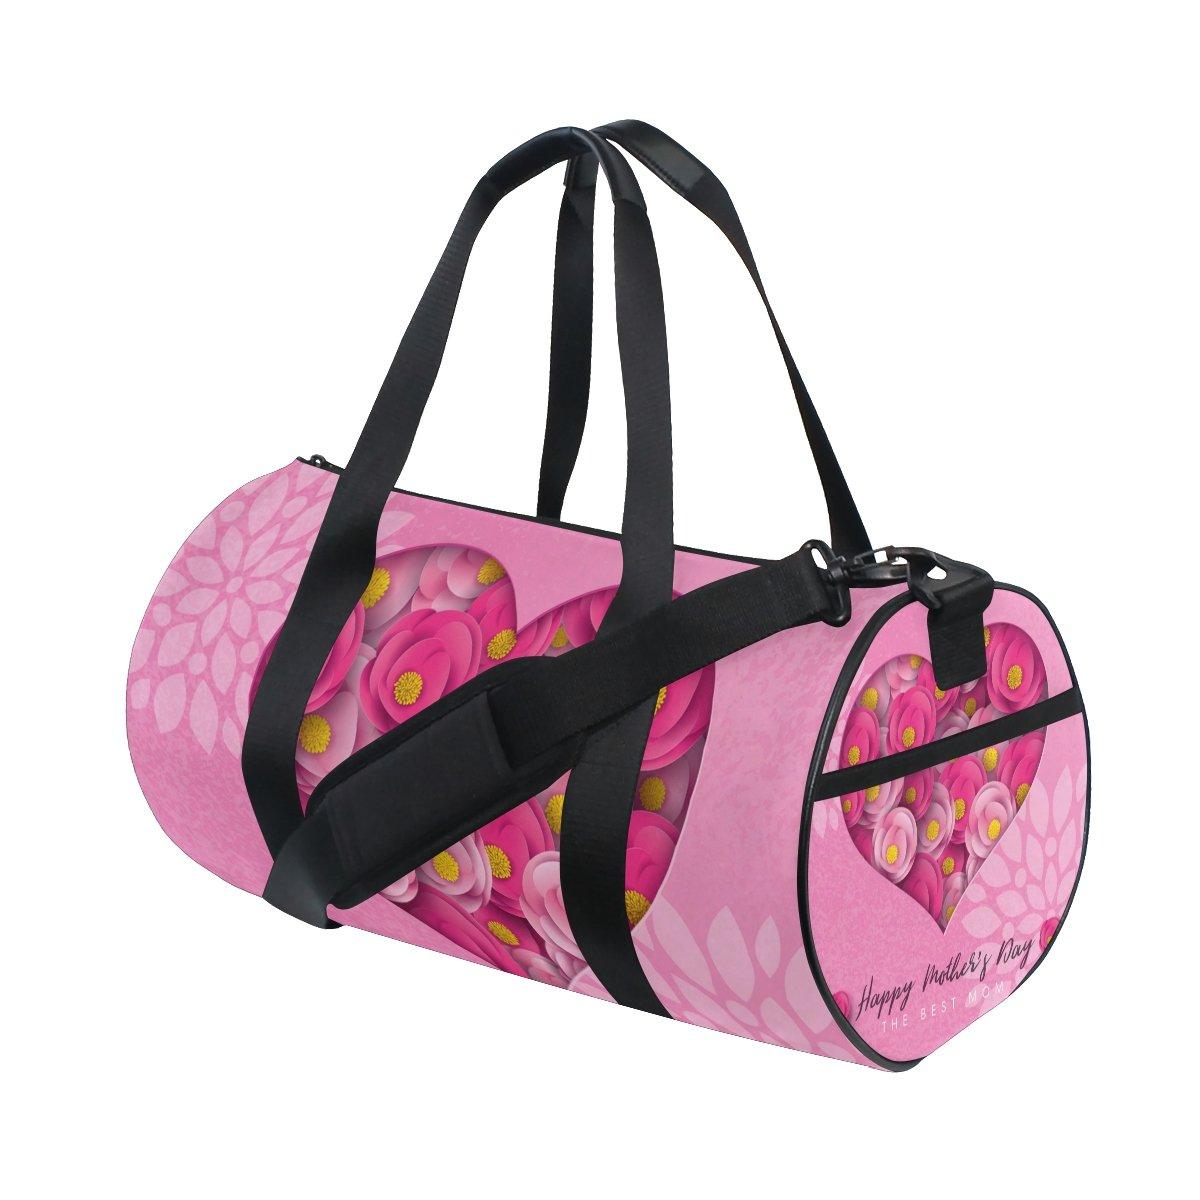 U LIFE Happy Mothers Day Floral Flowers Love Heart Sports Gym Shoulder Handy Duffel Bags for Women Men Kids Boys Girls